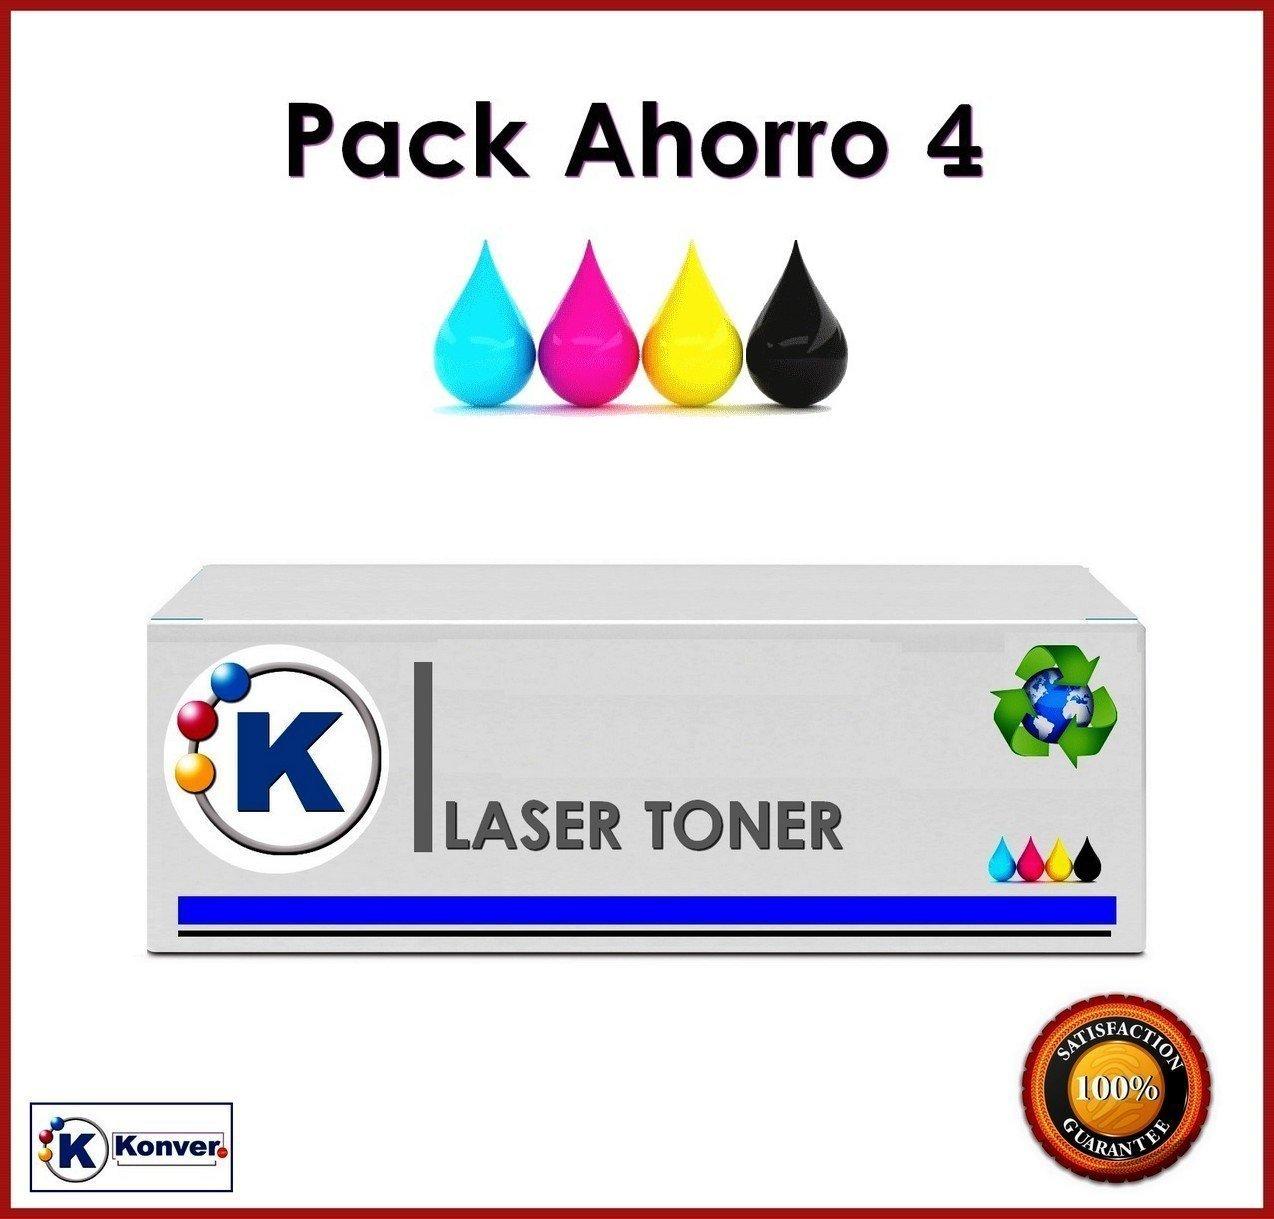 Pack Ahorro 4 Colores Toner Compatible KTN241/245 - Alta Capacidad Sustituye Brother TN241/245 para Impresoras Brother DCP-9020CDW KONVER